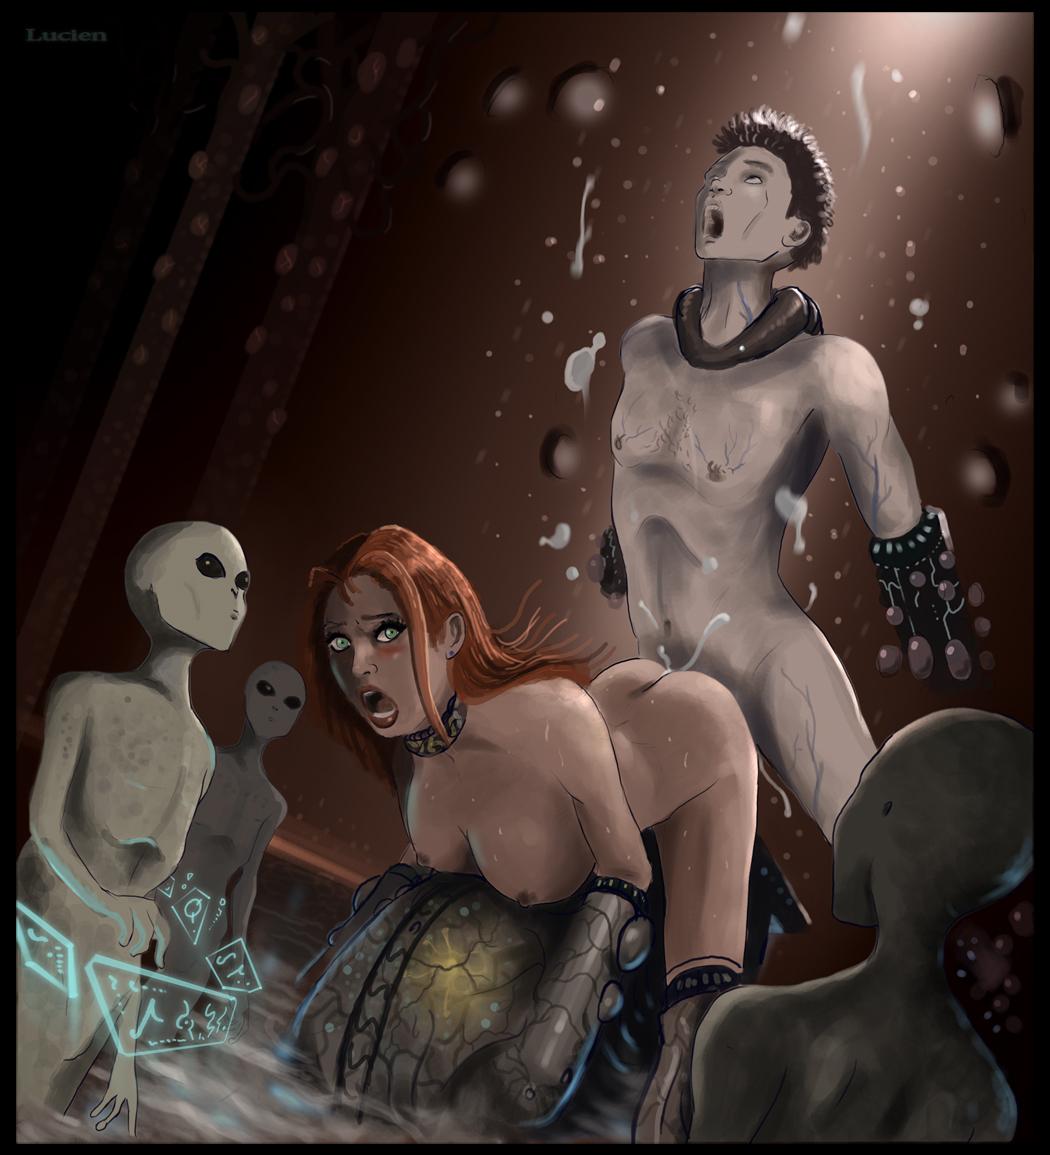 Nude alien girl 3gp hentia drunk wives